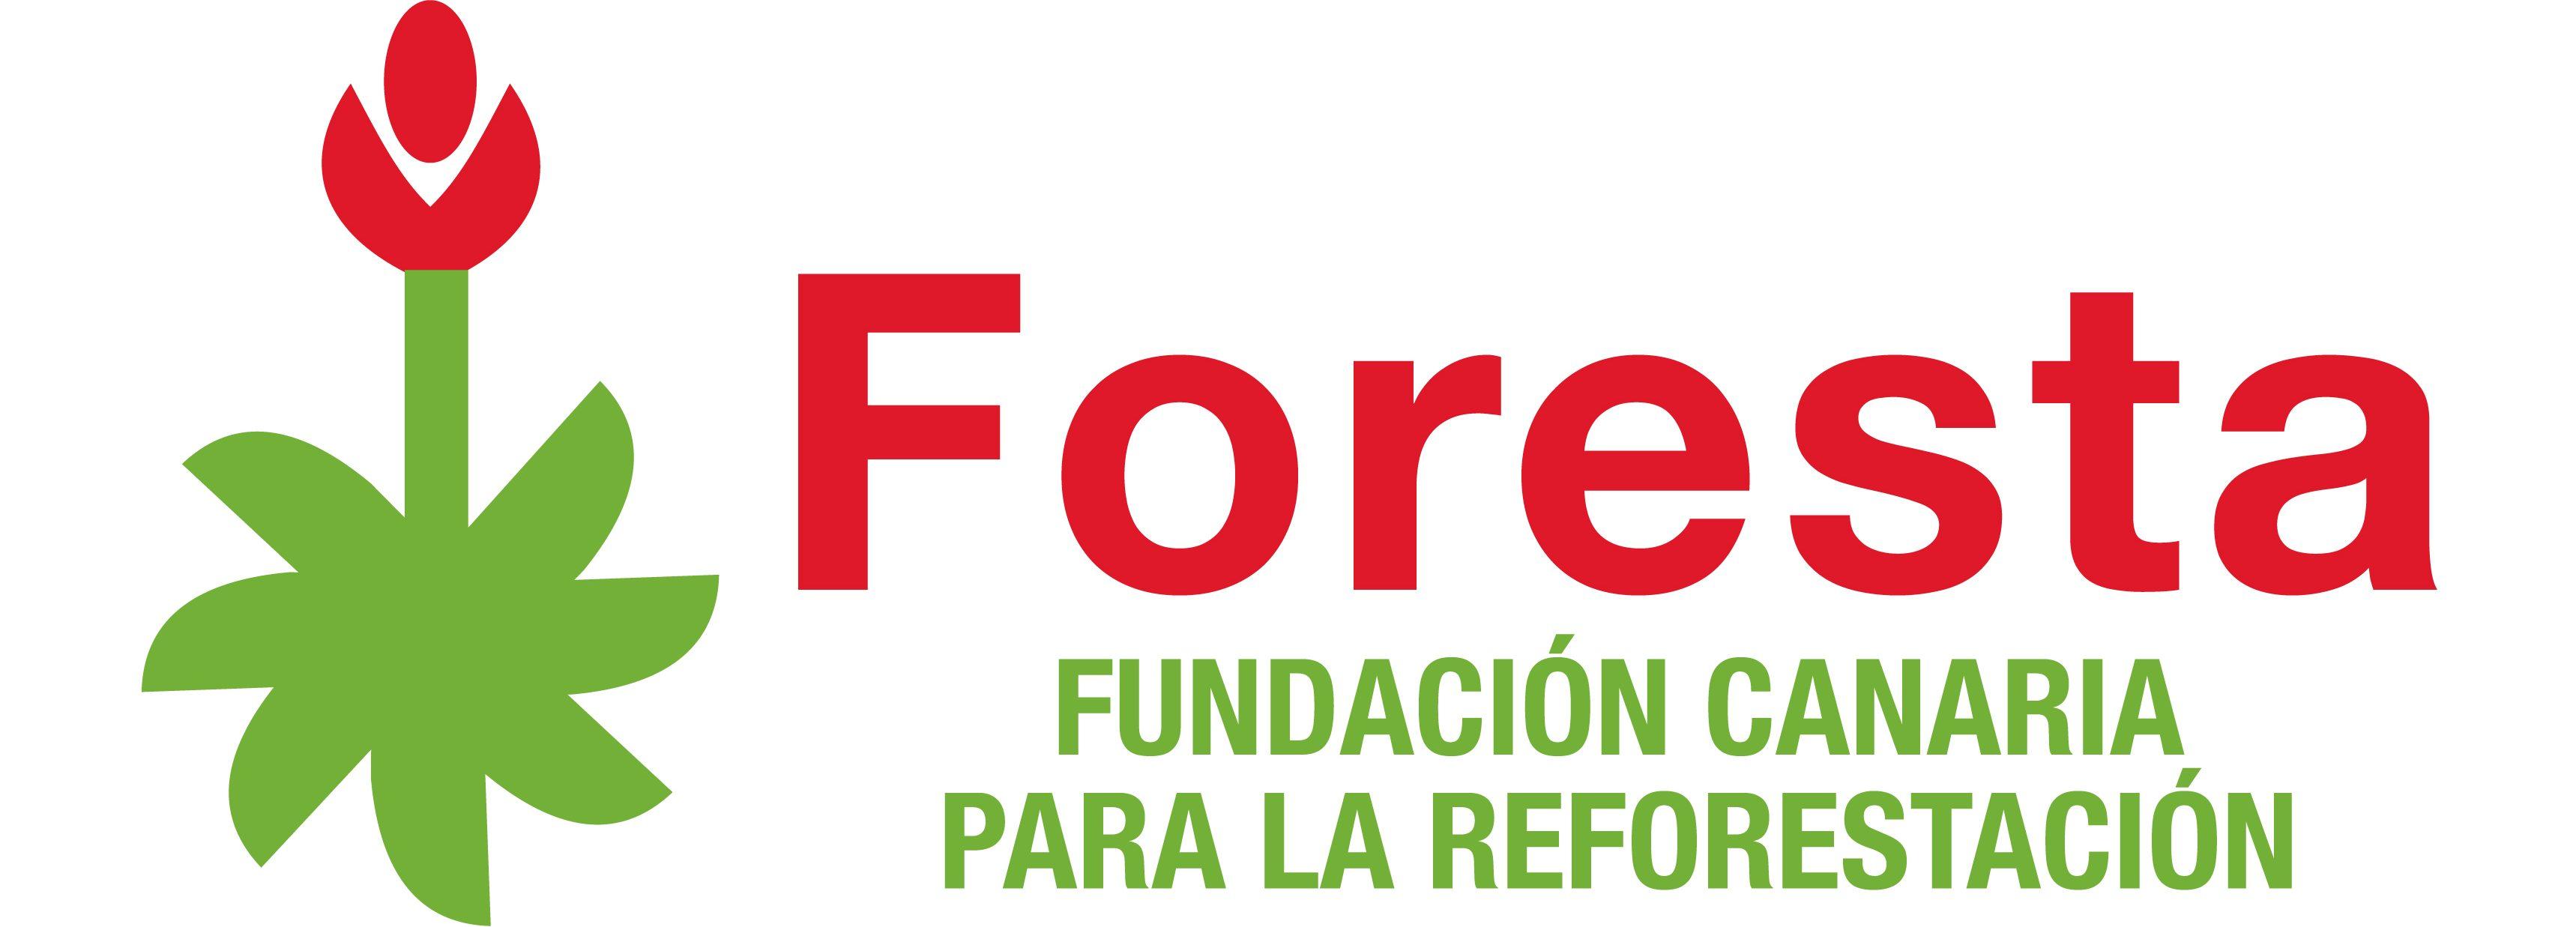 Fundacion Foresta